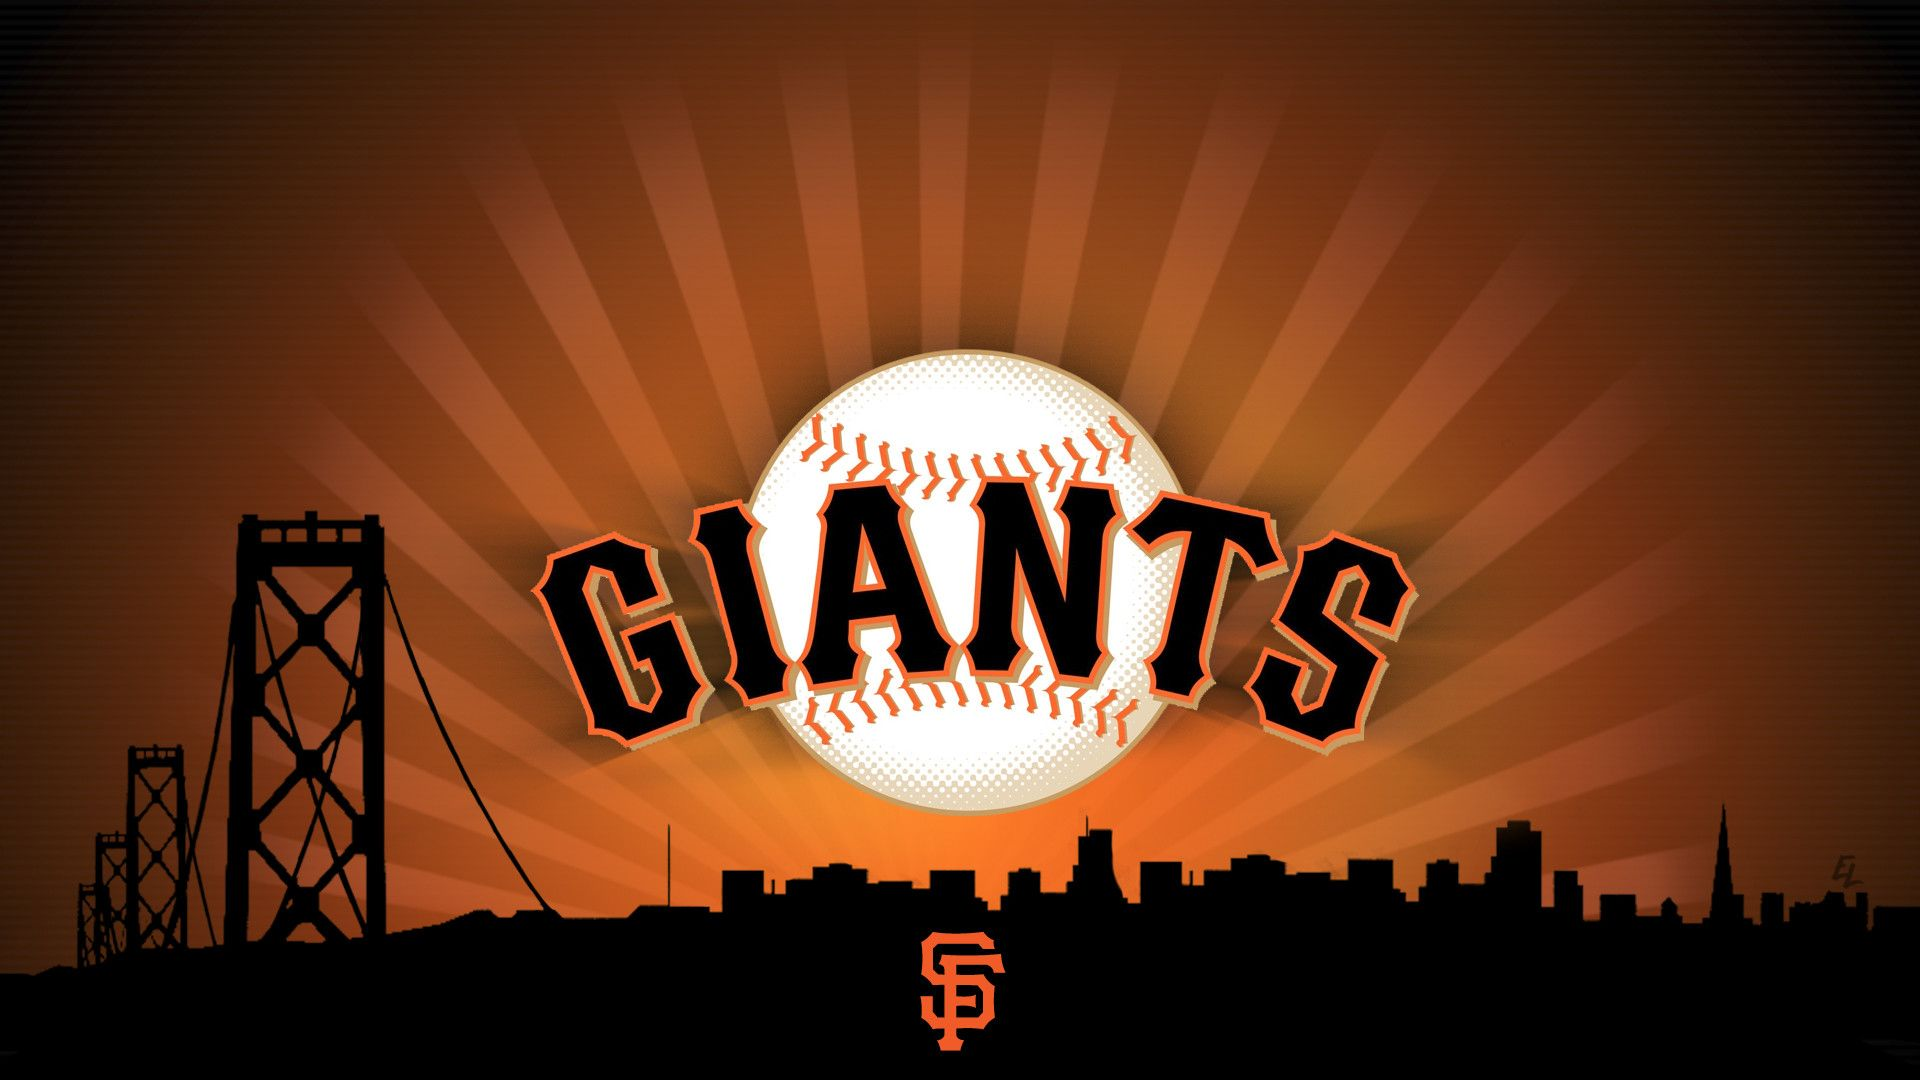 San Francisco Giants Wallpapers Top Free San Francisco Giants Backgrounds Wallpaperaccess